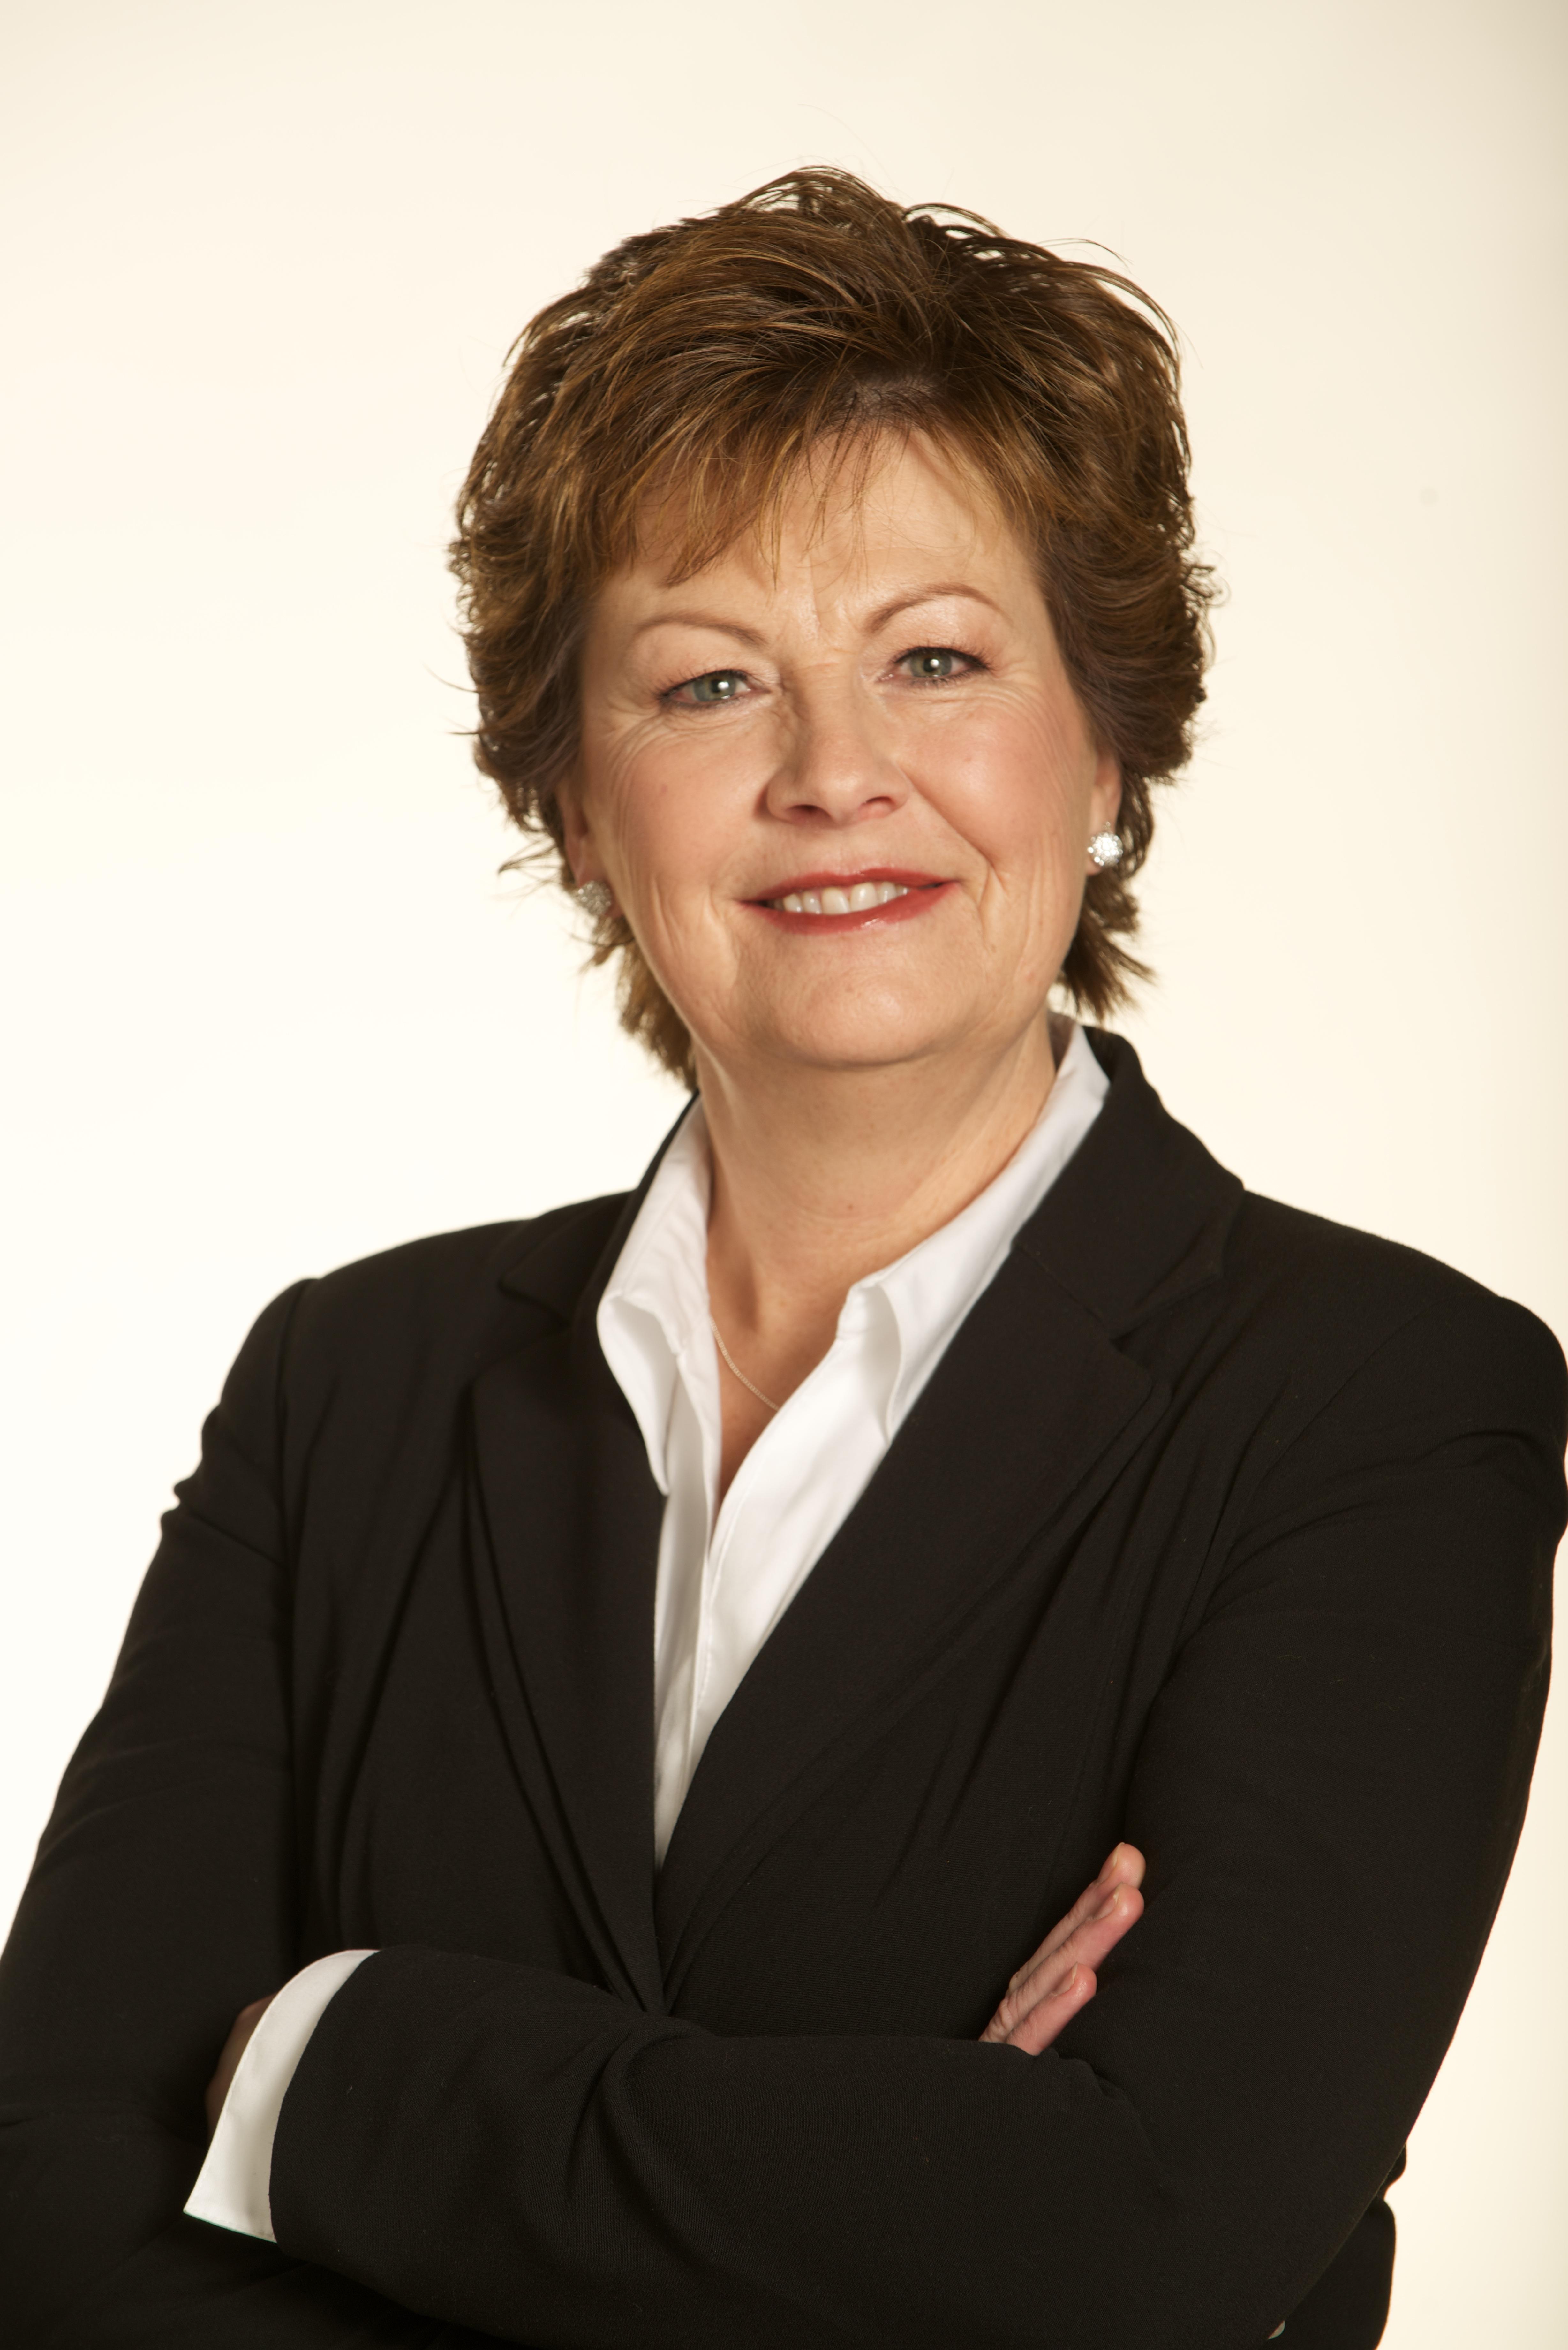 Headshot of Alanna Koch